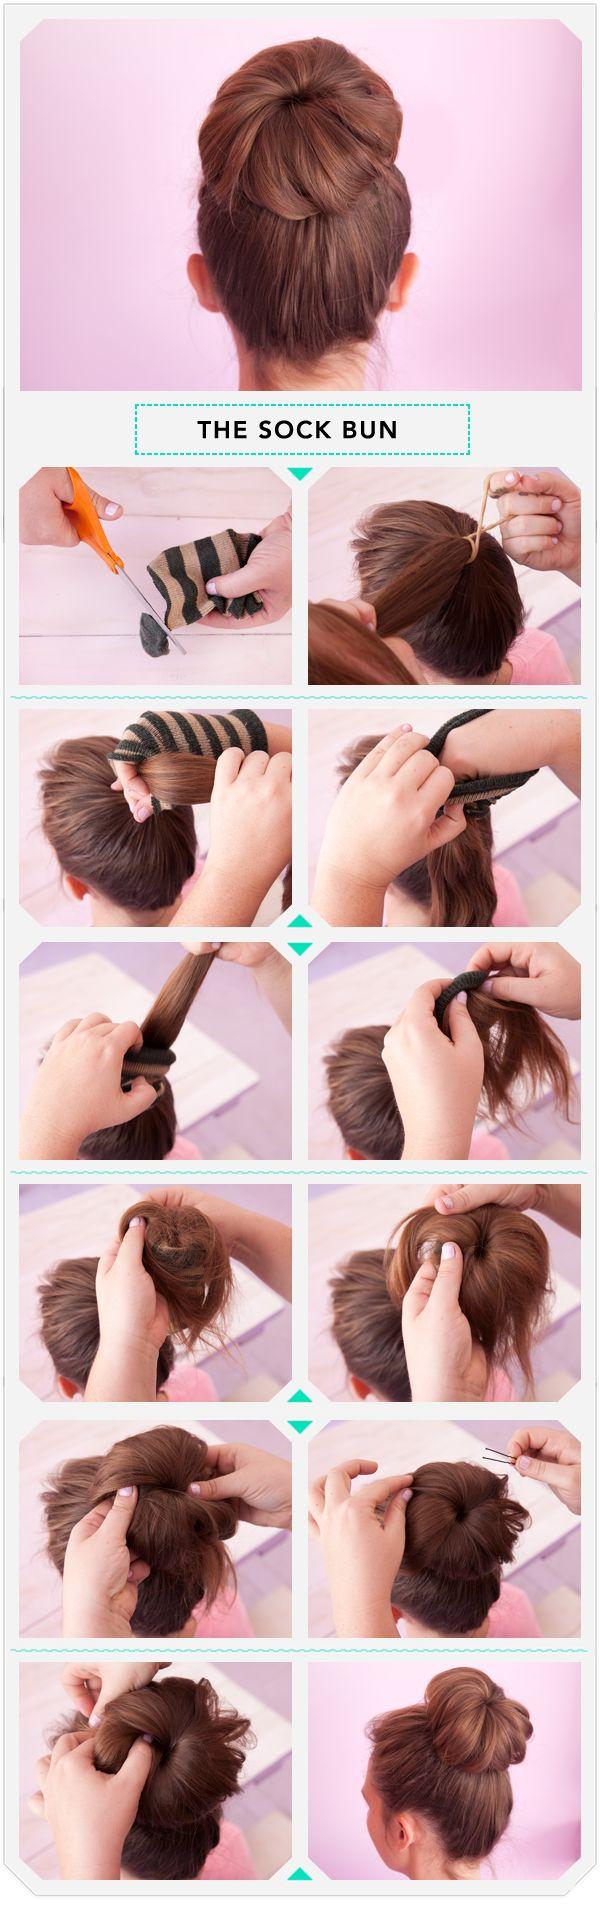 Hair Bow vs Sock Bun. 2 diy styles to consider… | paper + lace Sockenfrisur# Hochsteckfrisur# Frisur#Haare